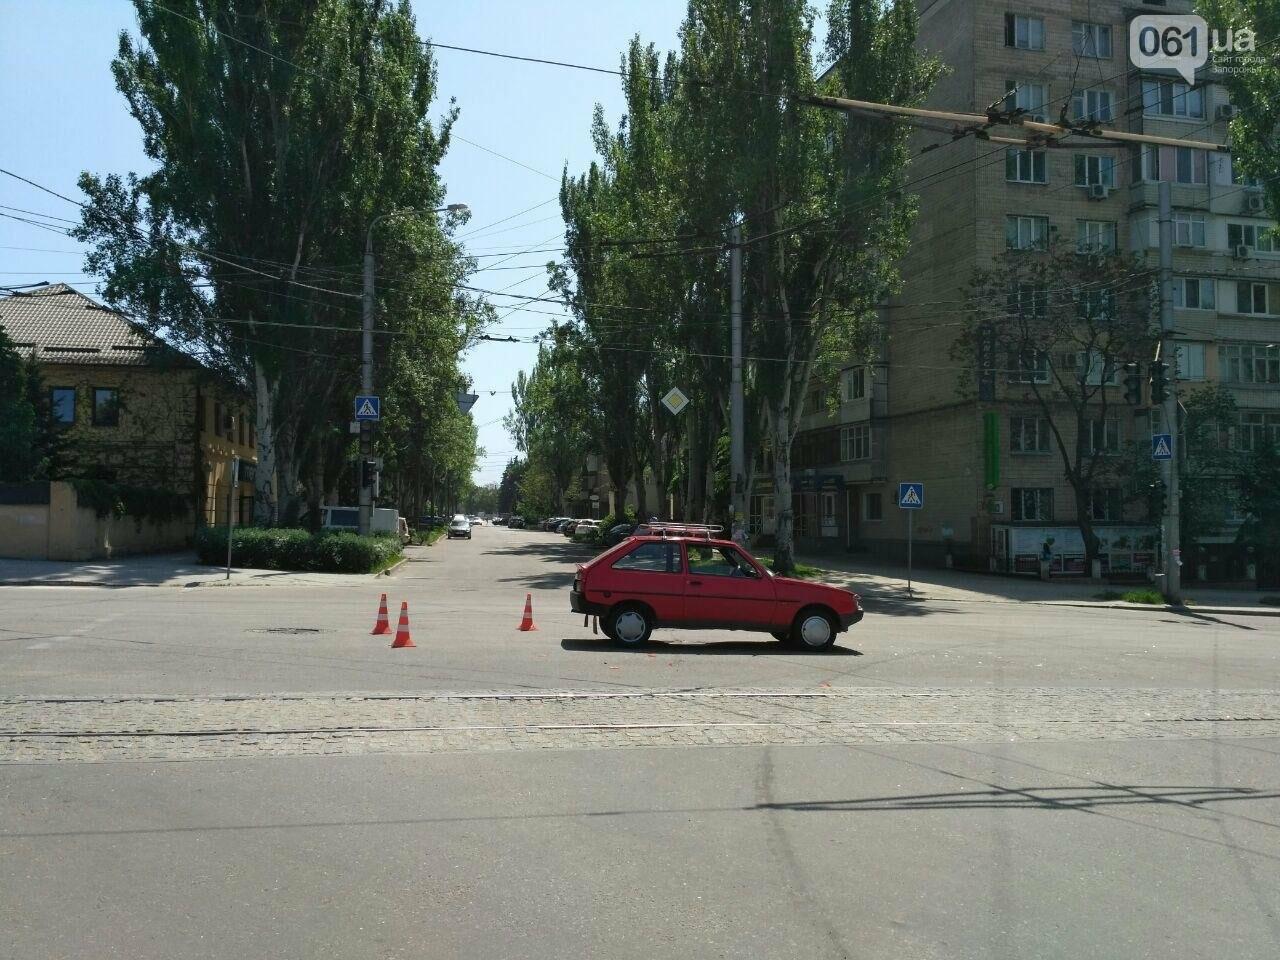 В центре Запорожья столкнулись ЗАЗ и TOYOTA, - ФОТО, фото-4